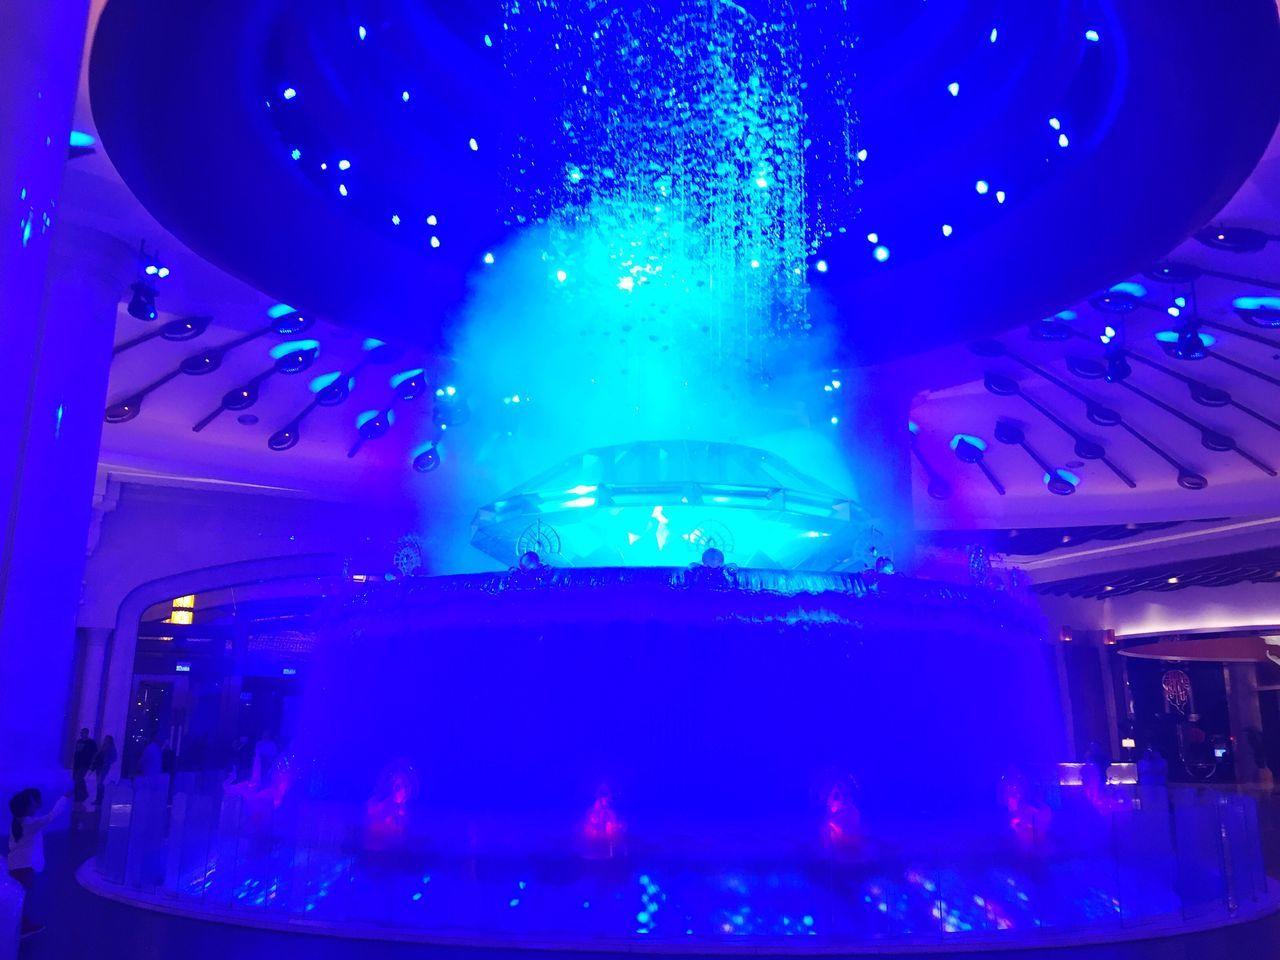 Galaxyhotelmacau Galaxyhotelcasino Galaxyhotel Lobby Casino Macau 🇲🇴